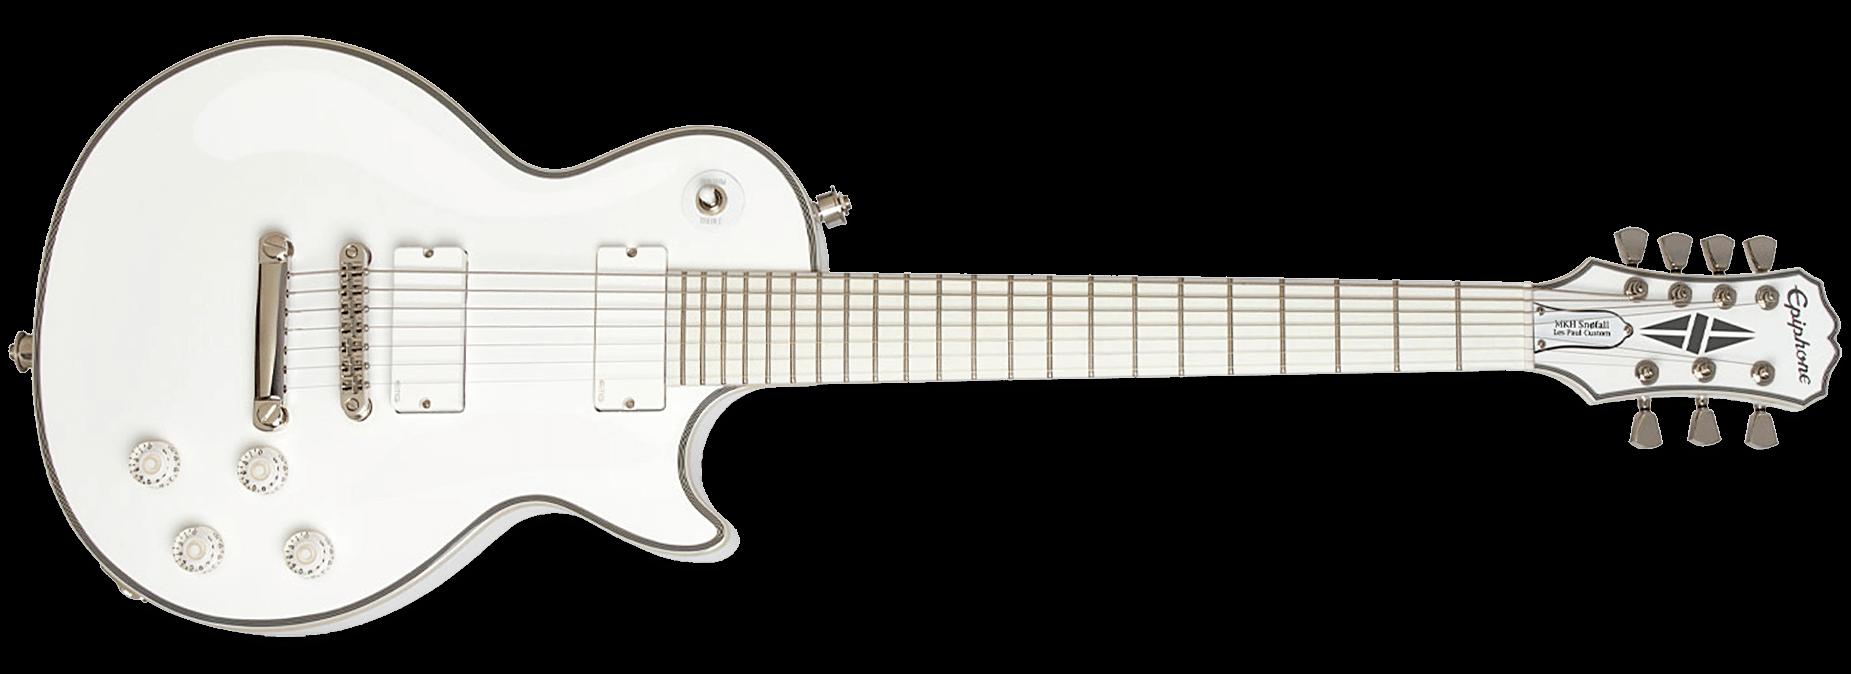 Epiphone Matt Heafy Snofall Les Paul Custom 7 Alpine White